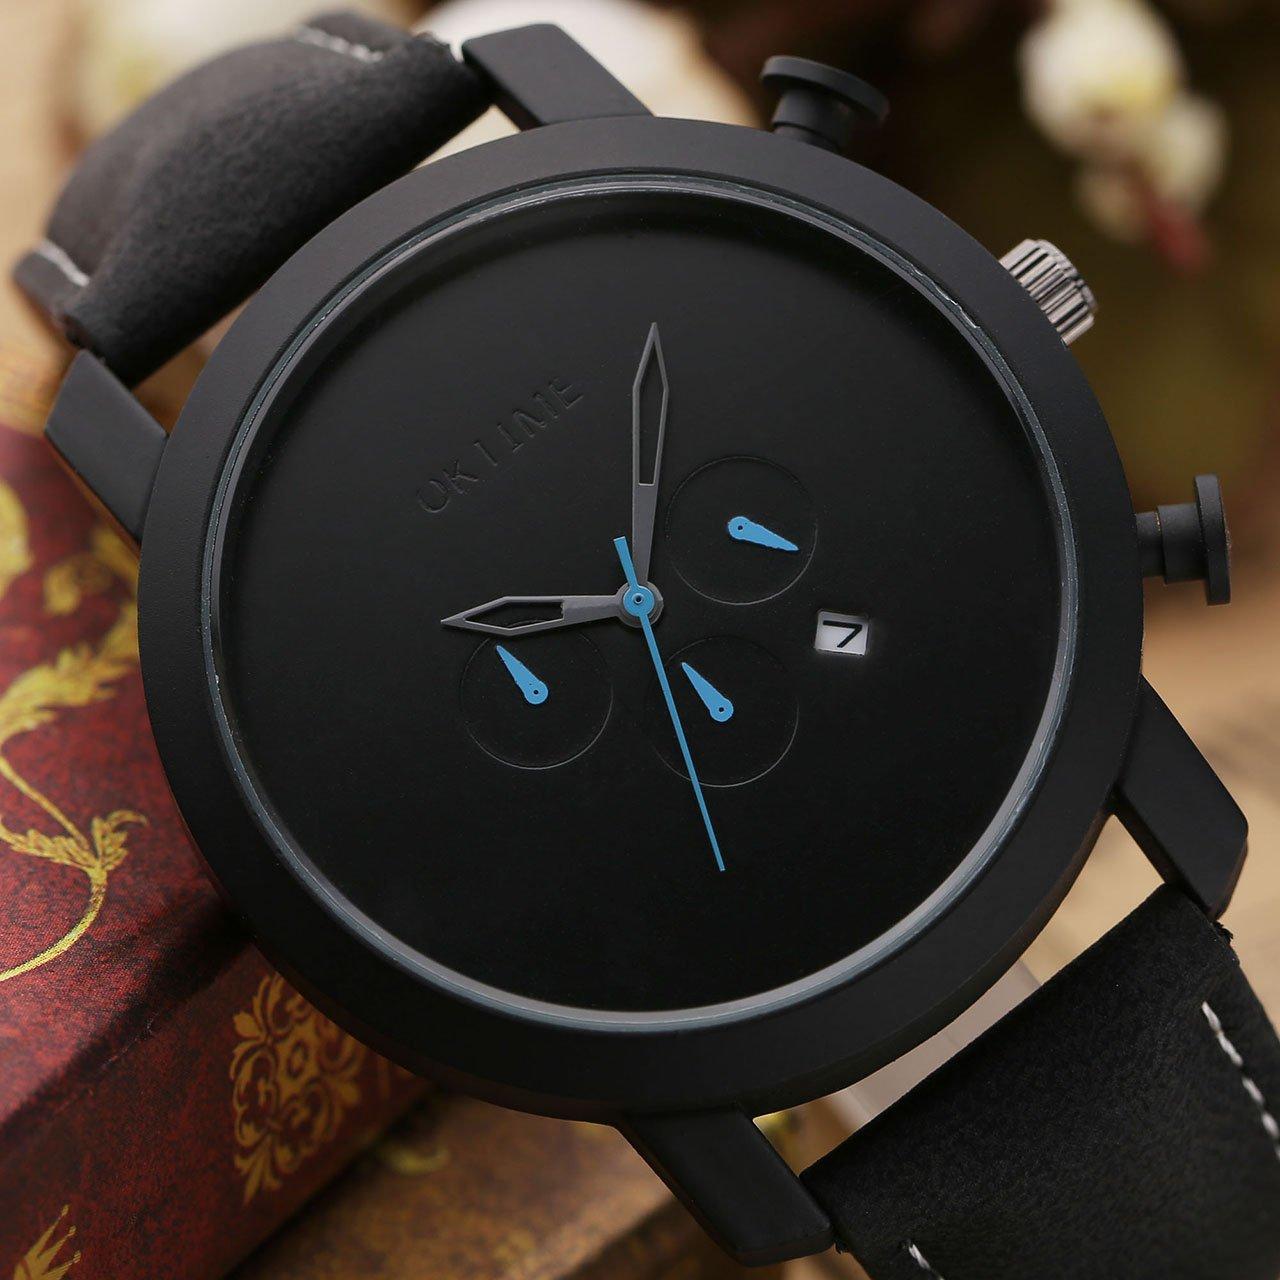 JSDDE Uhren,Sport Armbanduhr DREI unecht Chronograph 3ATM Wasserdicht Kalender Analog Quarz Uhr Echtleder Armband,schwarz